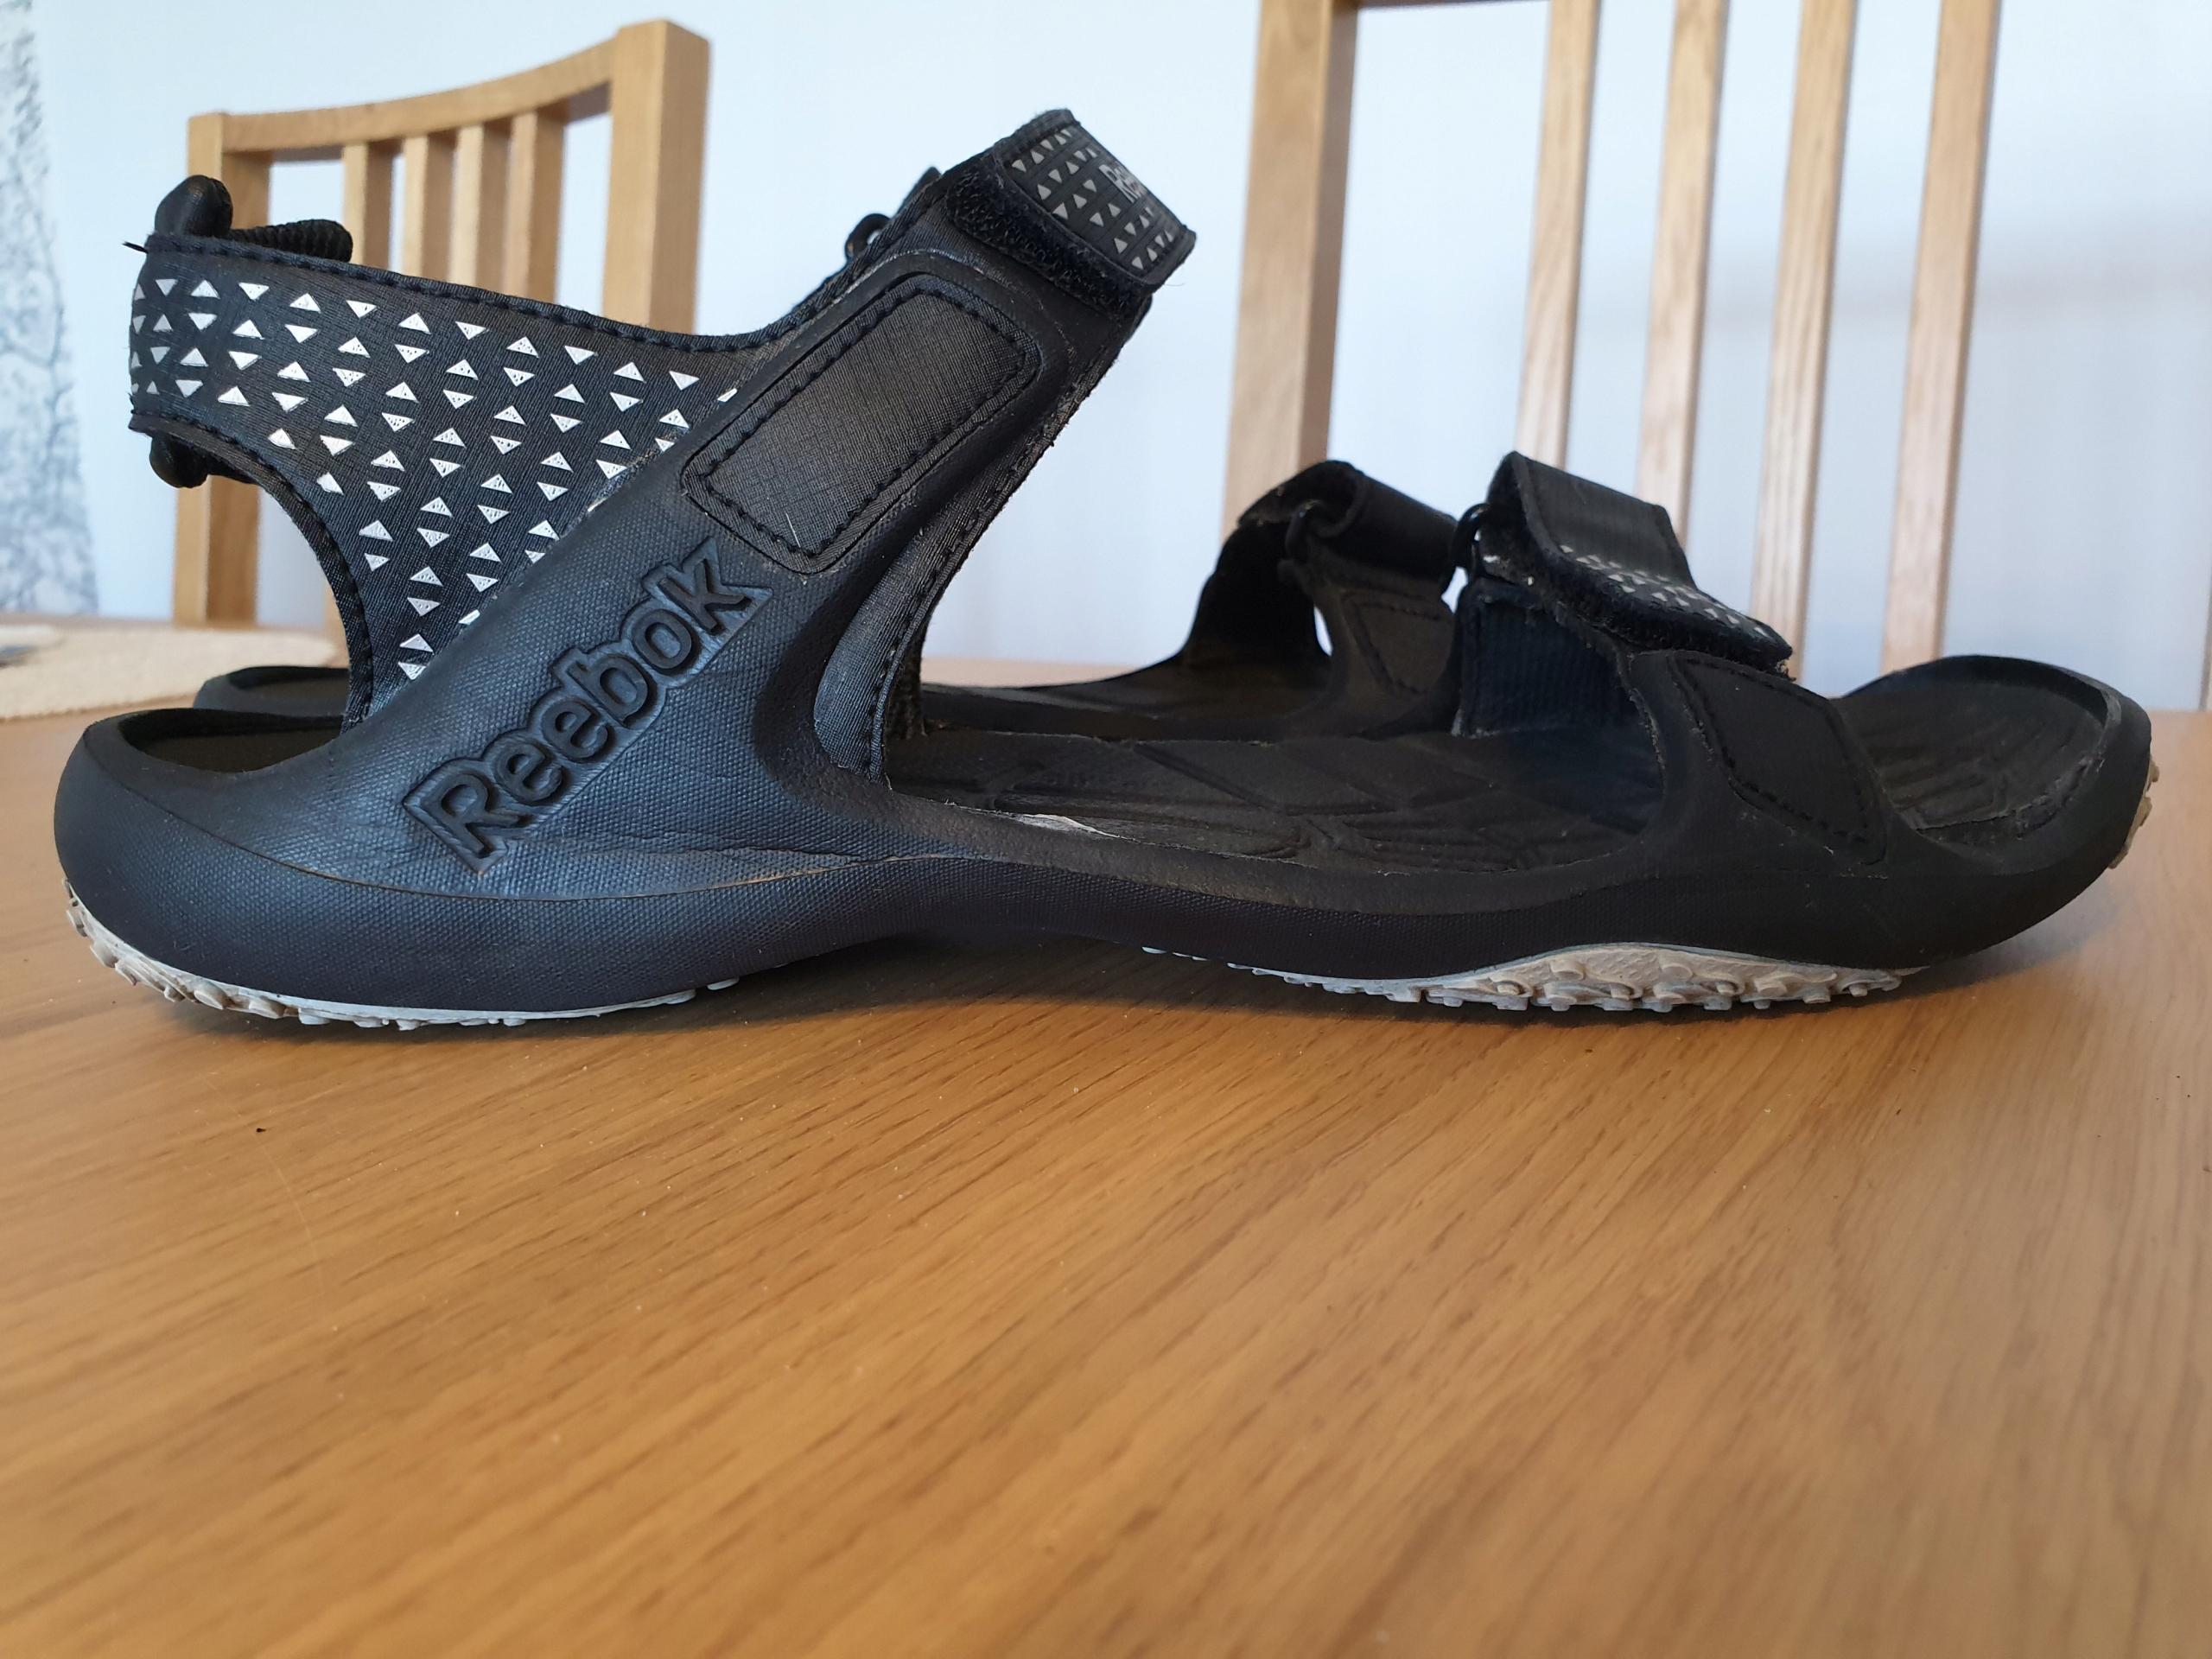 Sportowe sandały REEBOK TRAIL SERPENT II V45105 42